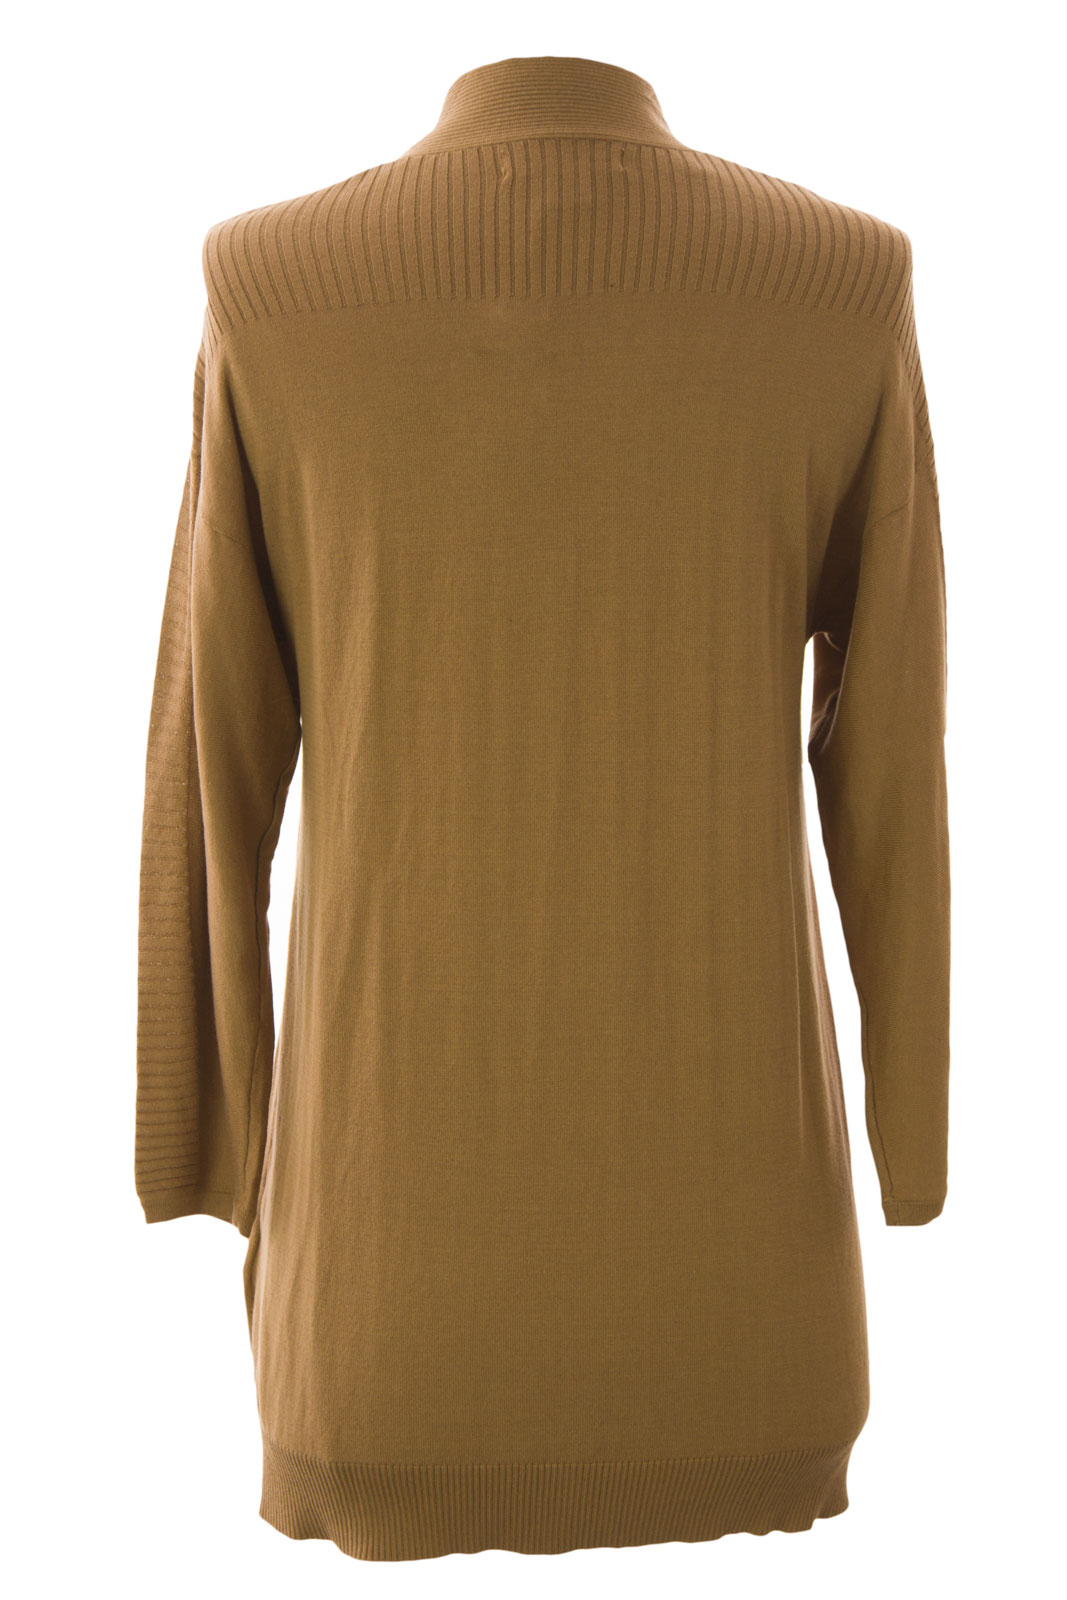 August Silk Women's Rib Trim Flyaway Cardigan S Noble Khaki | eBay